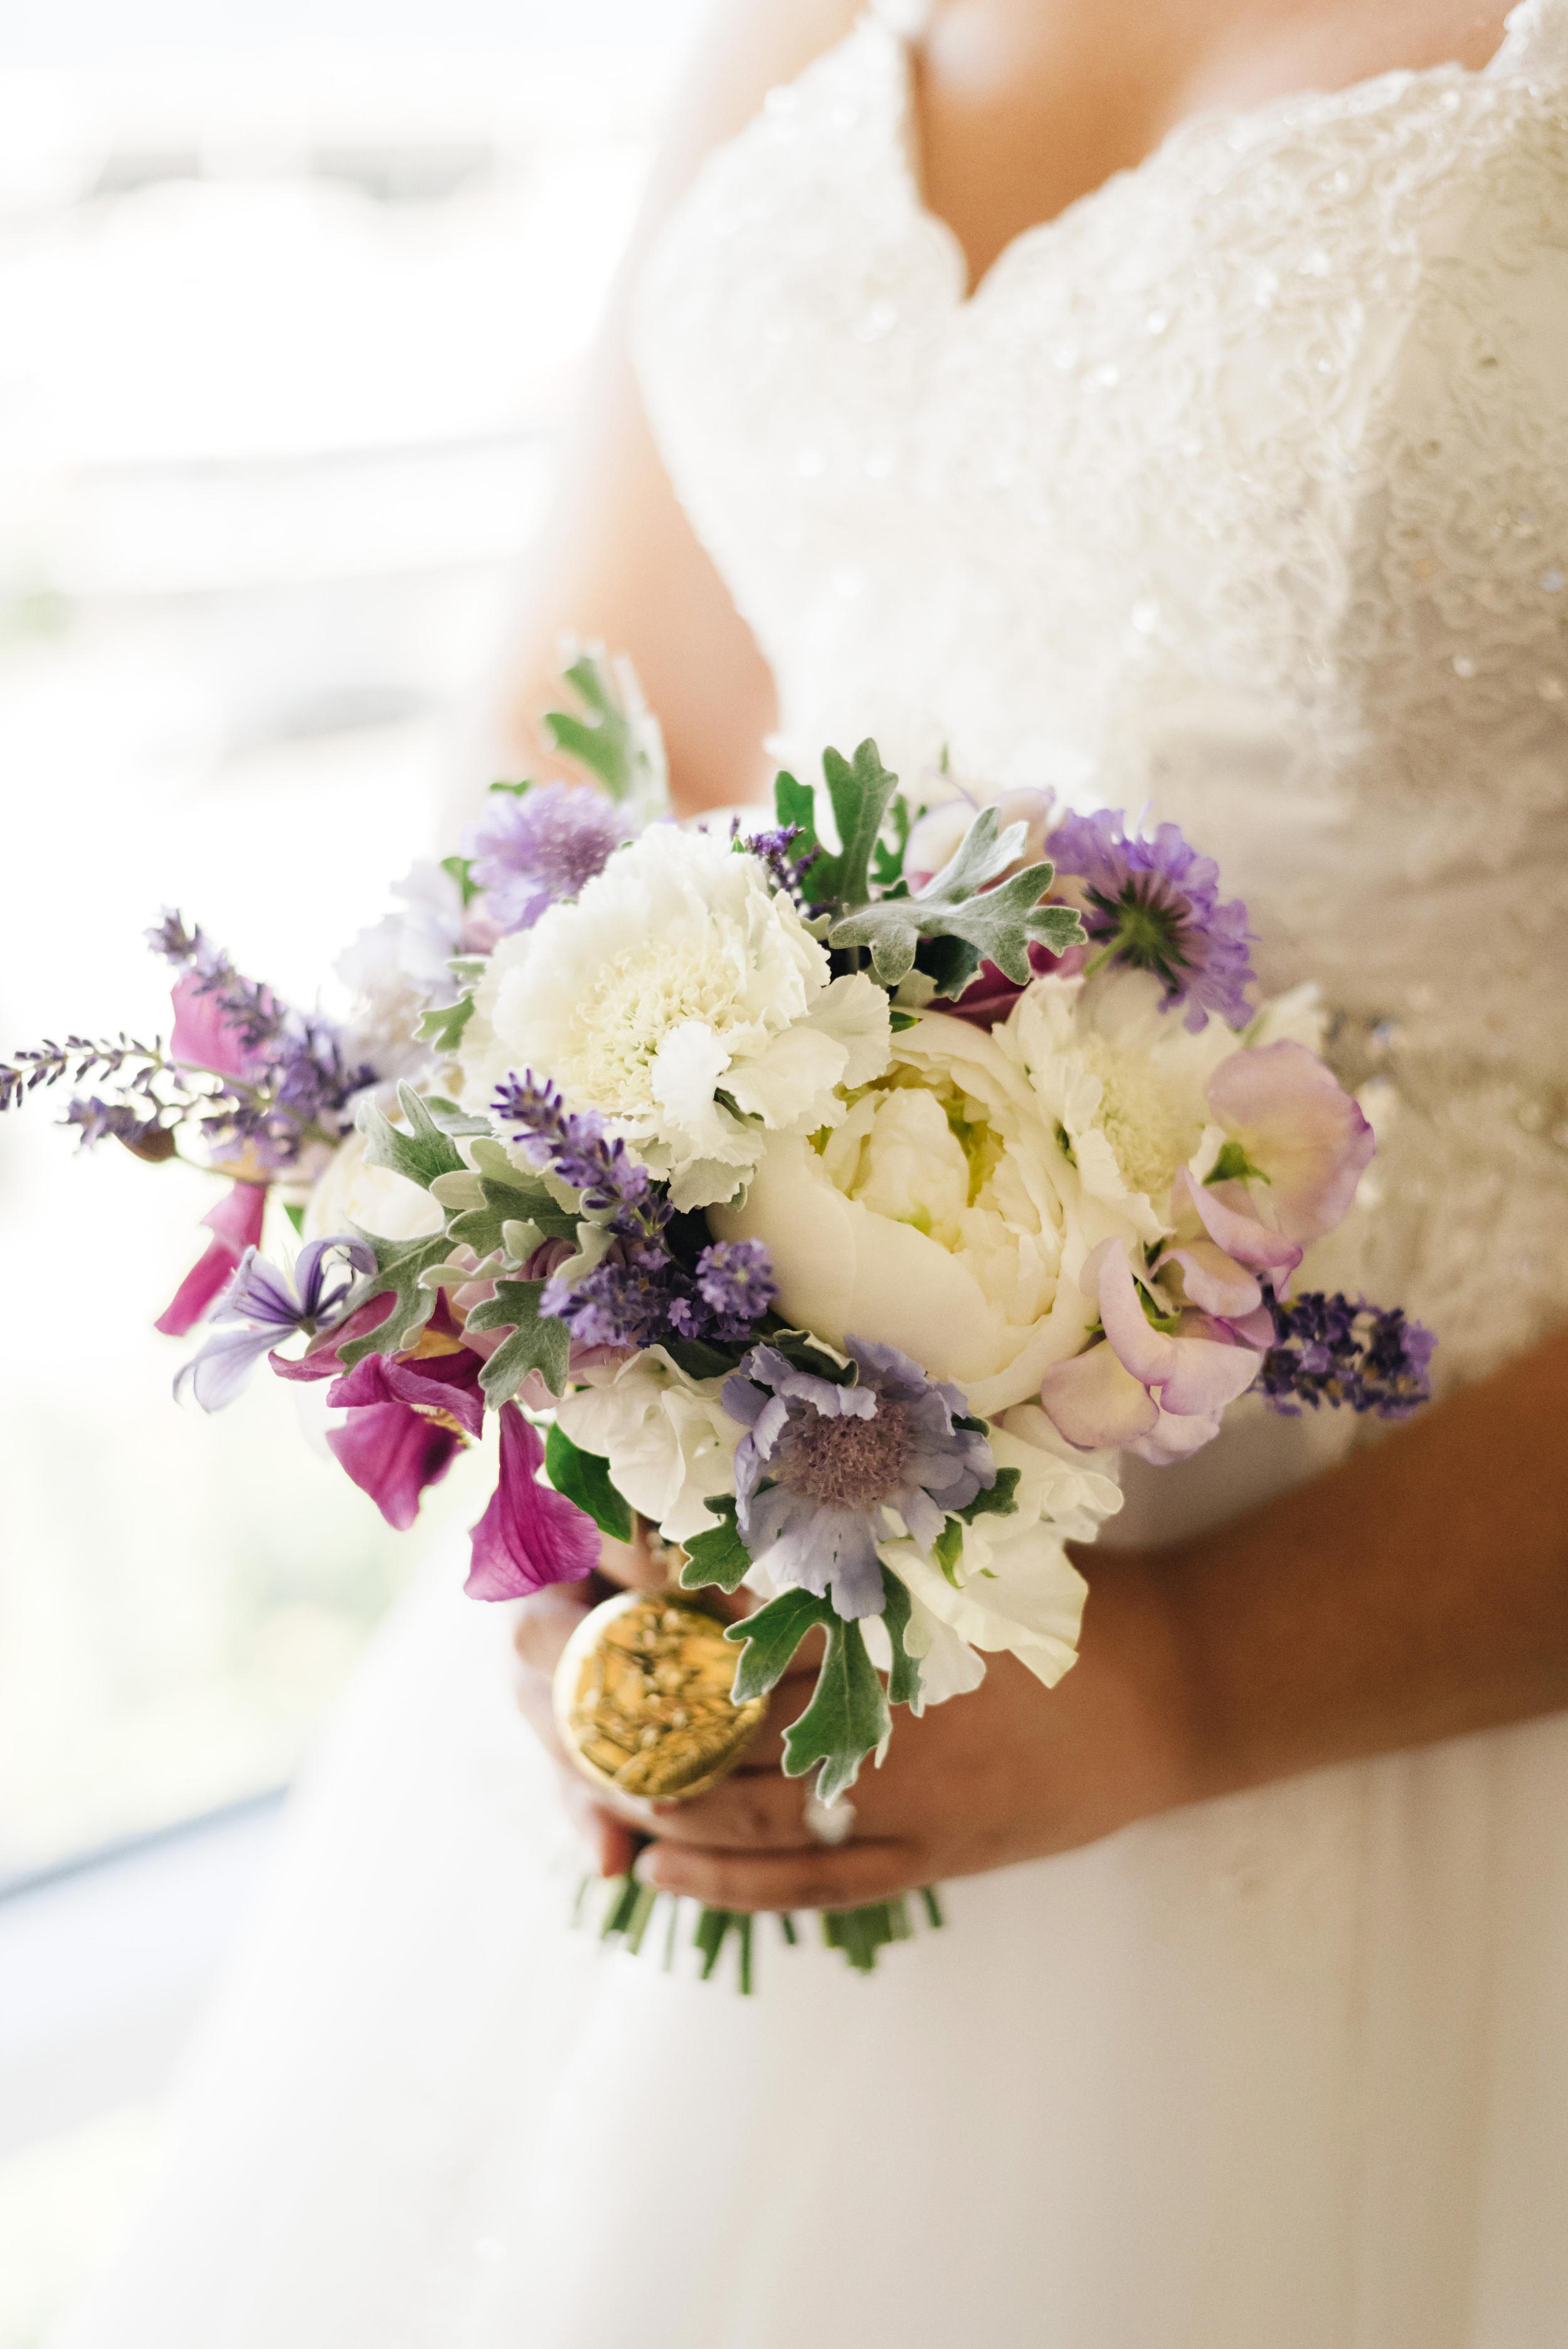 Garden Romantic White and Purple Wedding Bouquet | Joe and Patience Photography | Filipino Wedding Planner | Seattle Wedding Planner | Ballard Bay Club Wedding